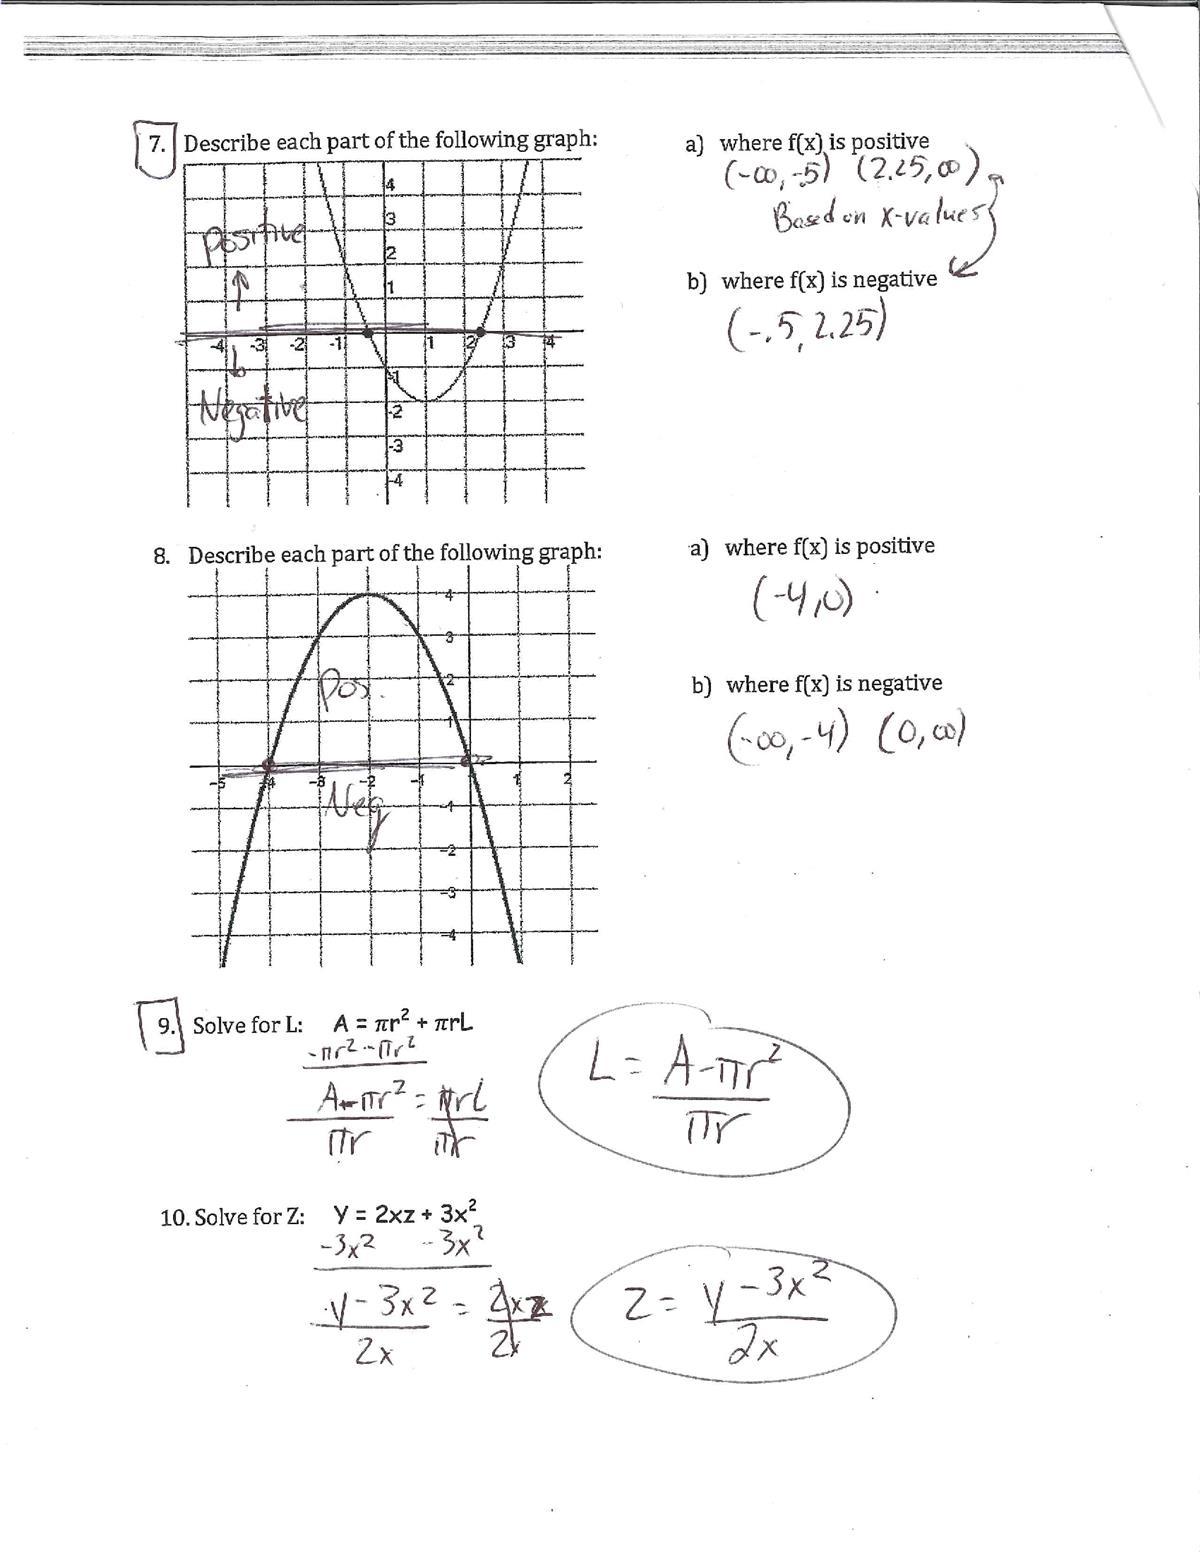 Zarro, Michael / Algebra 1 - Final Exam Review - Answer Key